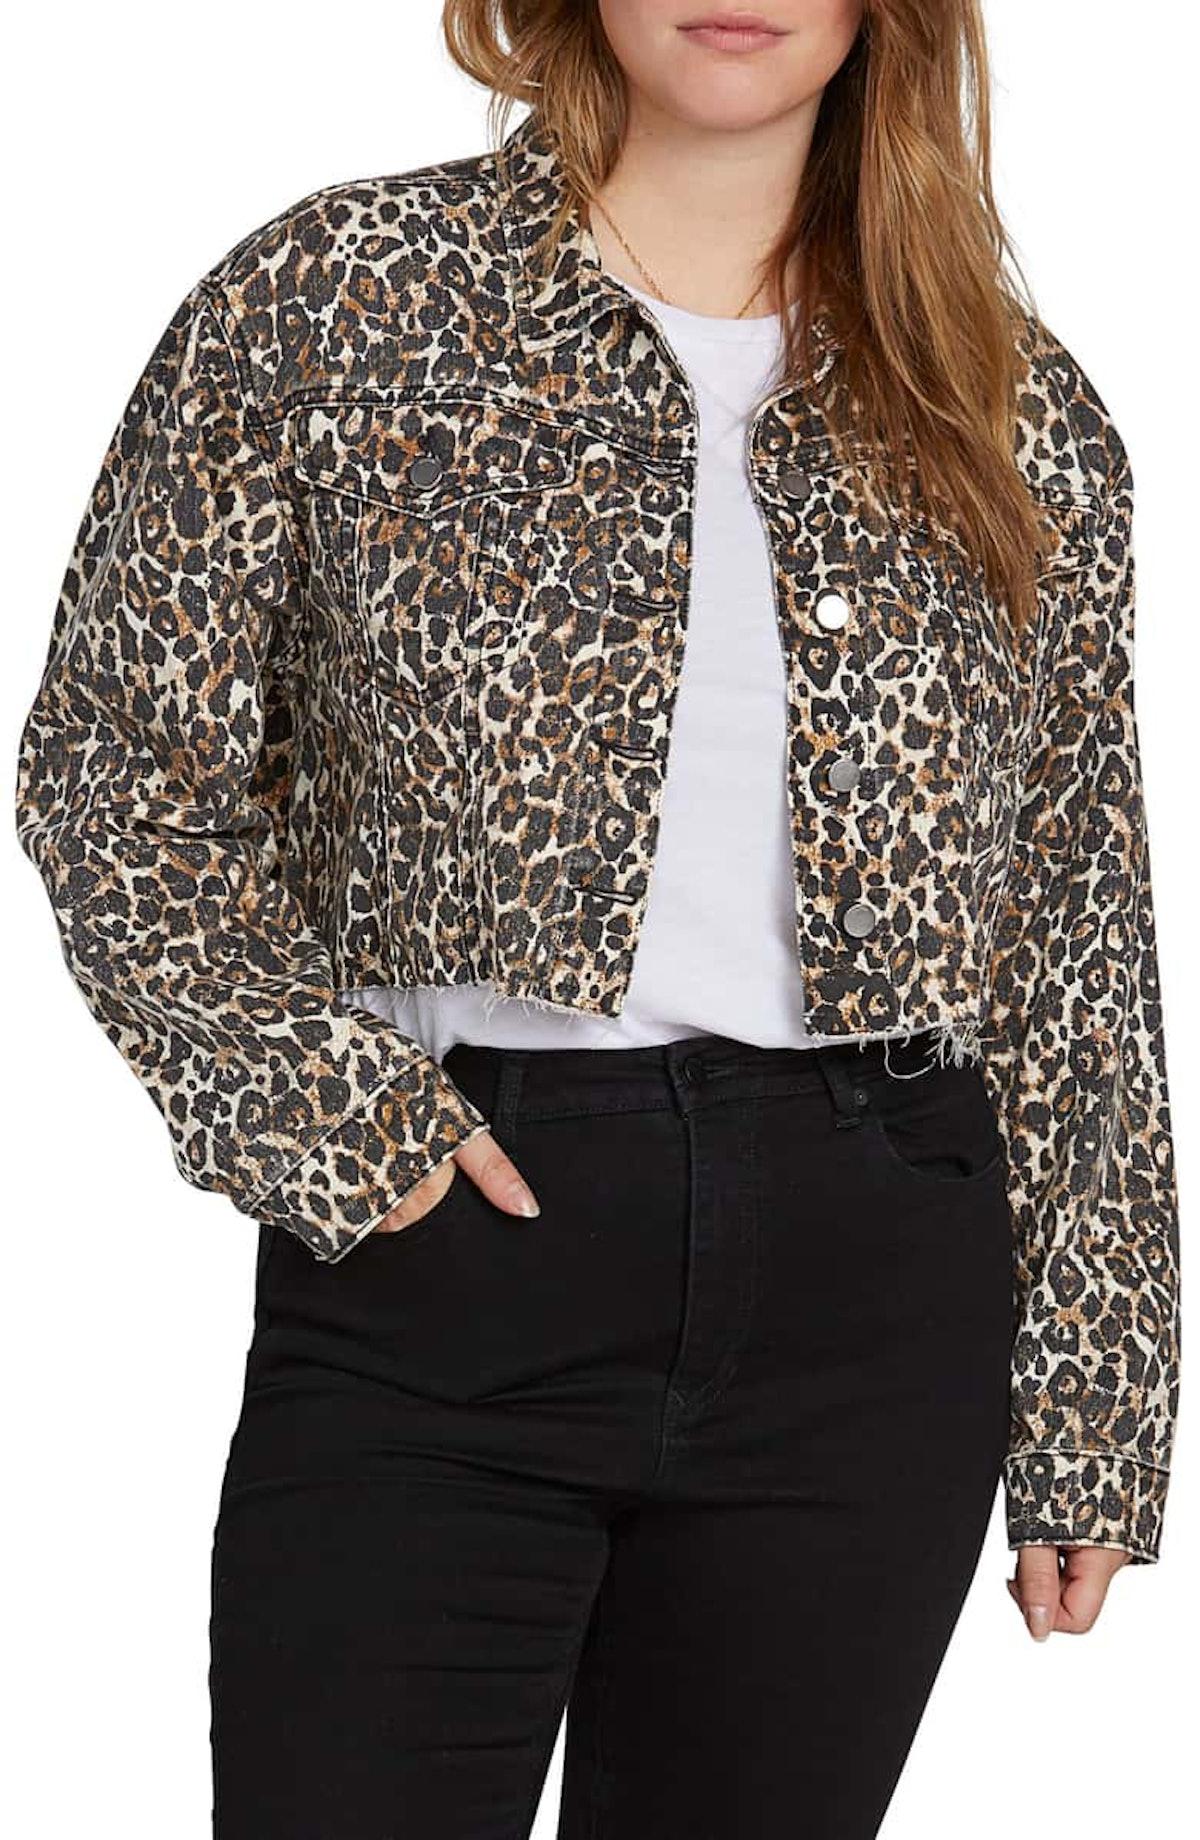 VOLCOM Super Stoney Leopard Print Denim Jacket